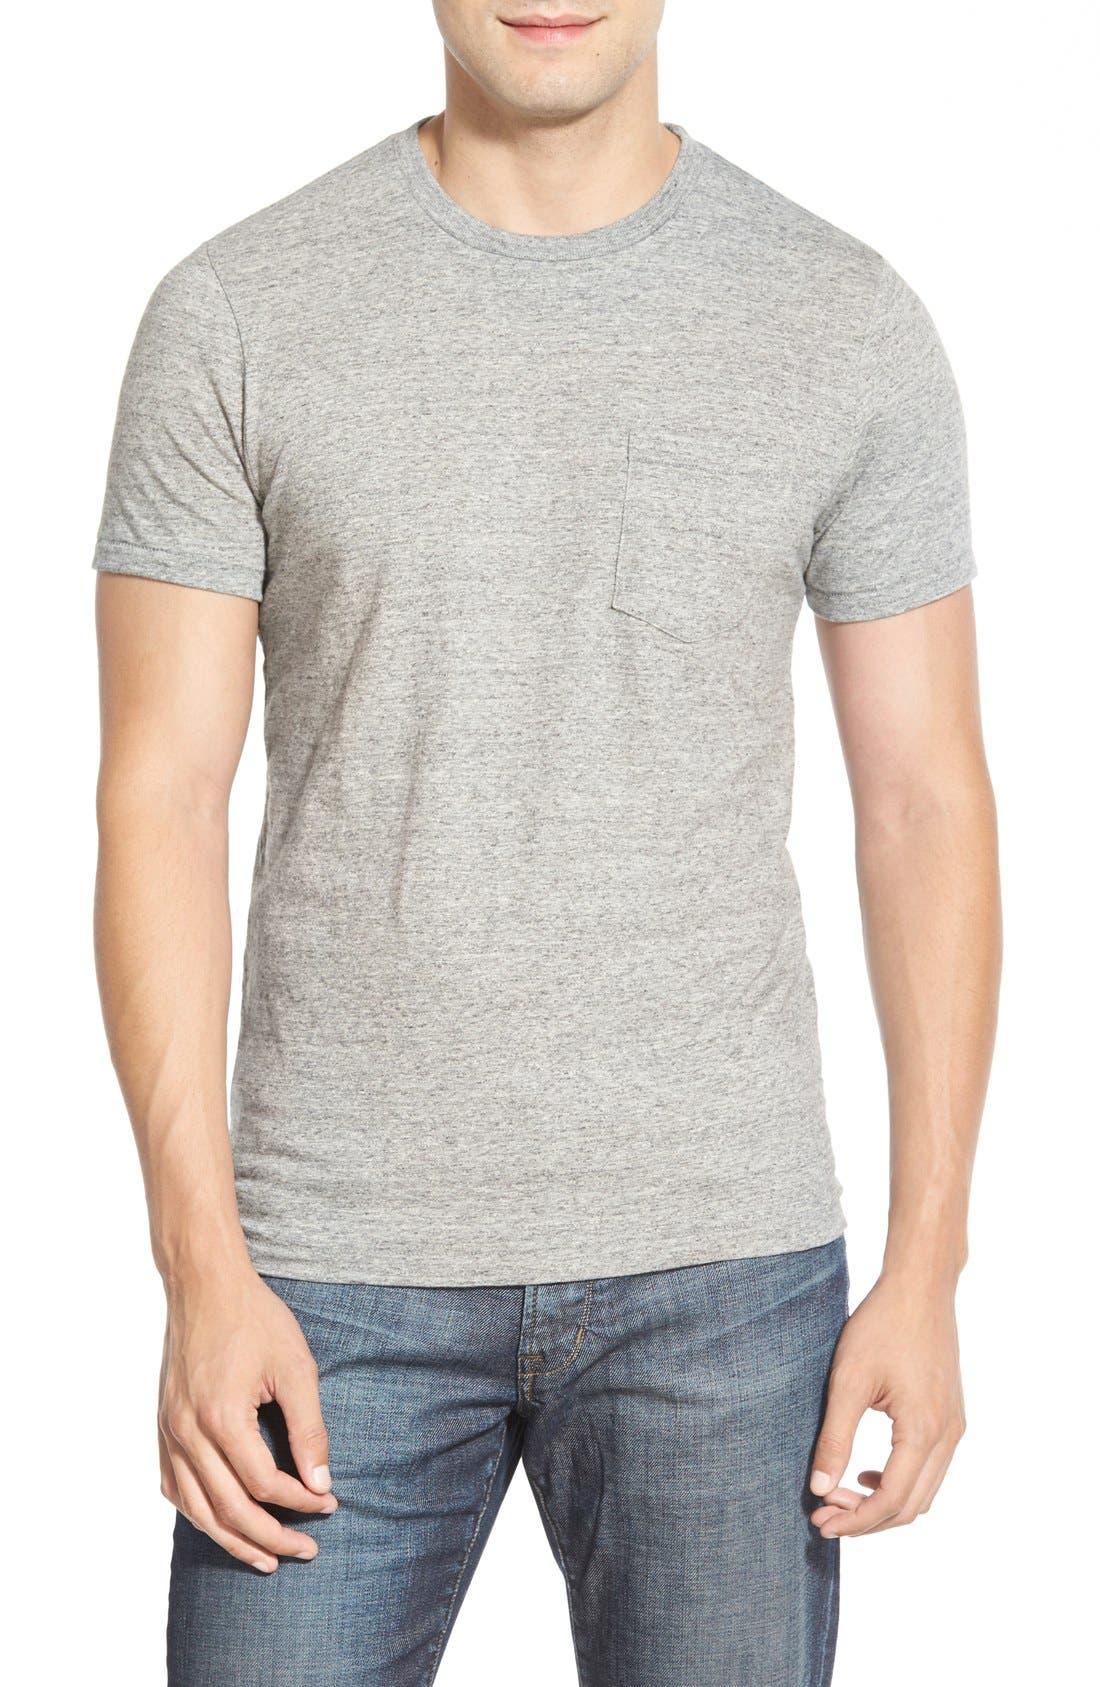 Double Face Jersey Pocket Crewneck T-Shirt,                             Main thumbnail 1, color,                             ANTI-GREY HEATHER